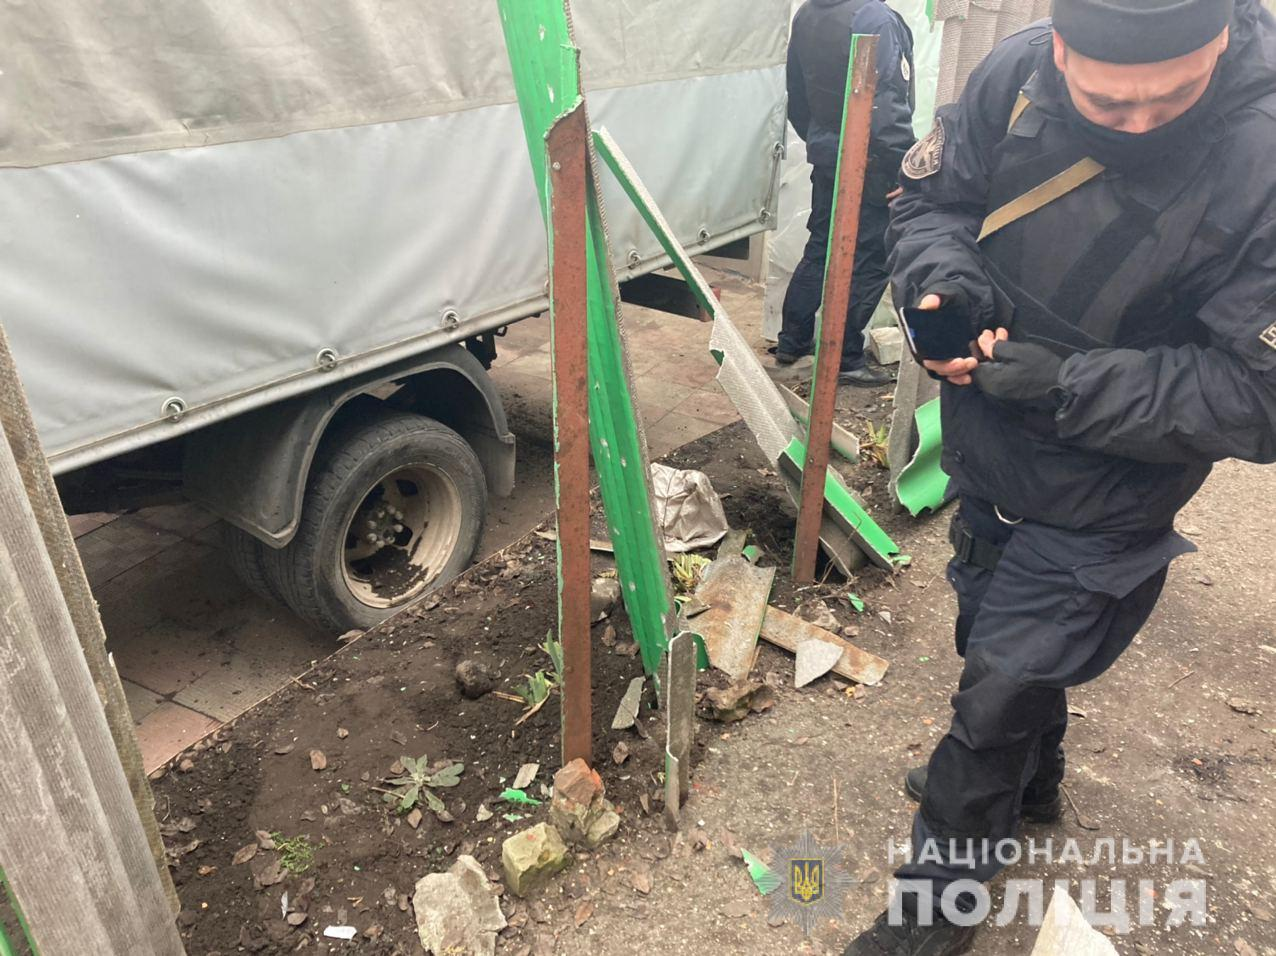 В Харькове во дворе частного дома взорвали гранату (фото)